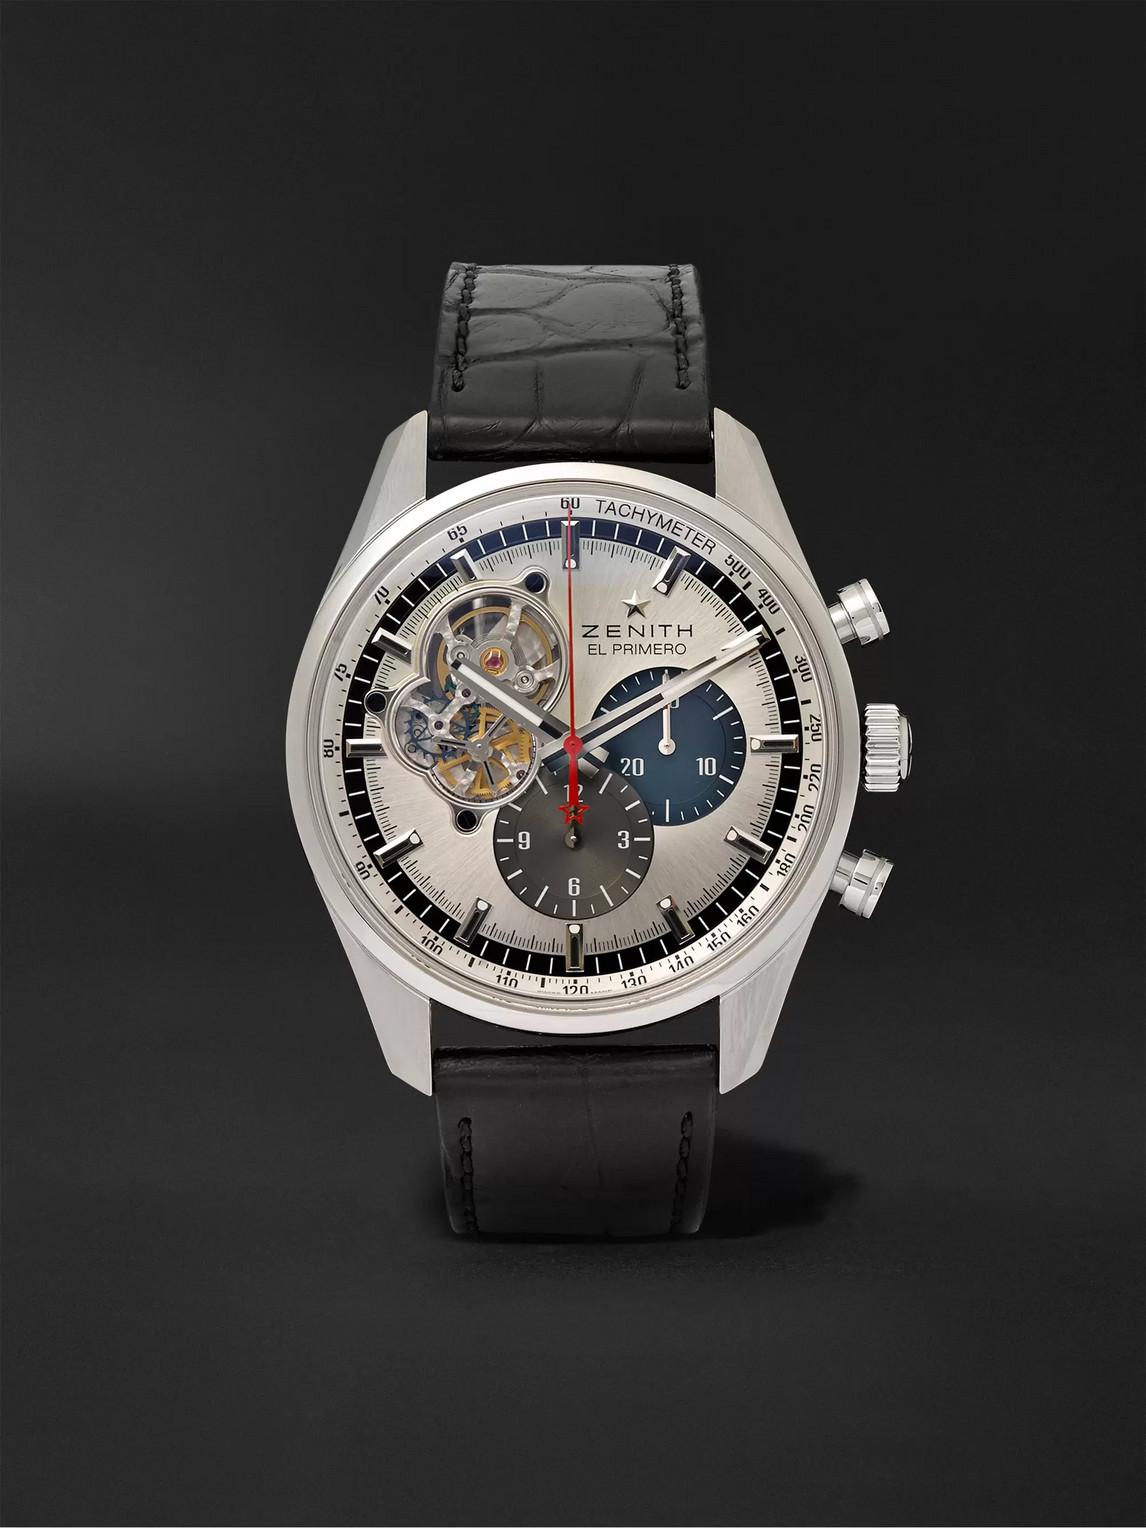 Zenith El Primero Chronomaster 1969 42mm Stainless Steel And Alligator Watch, Ref. No. 03.2040.4061/69.c496 In Silver